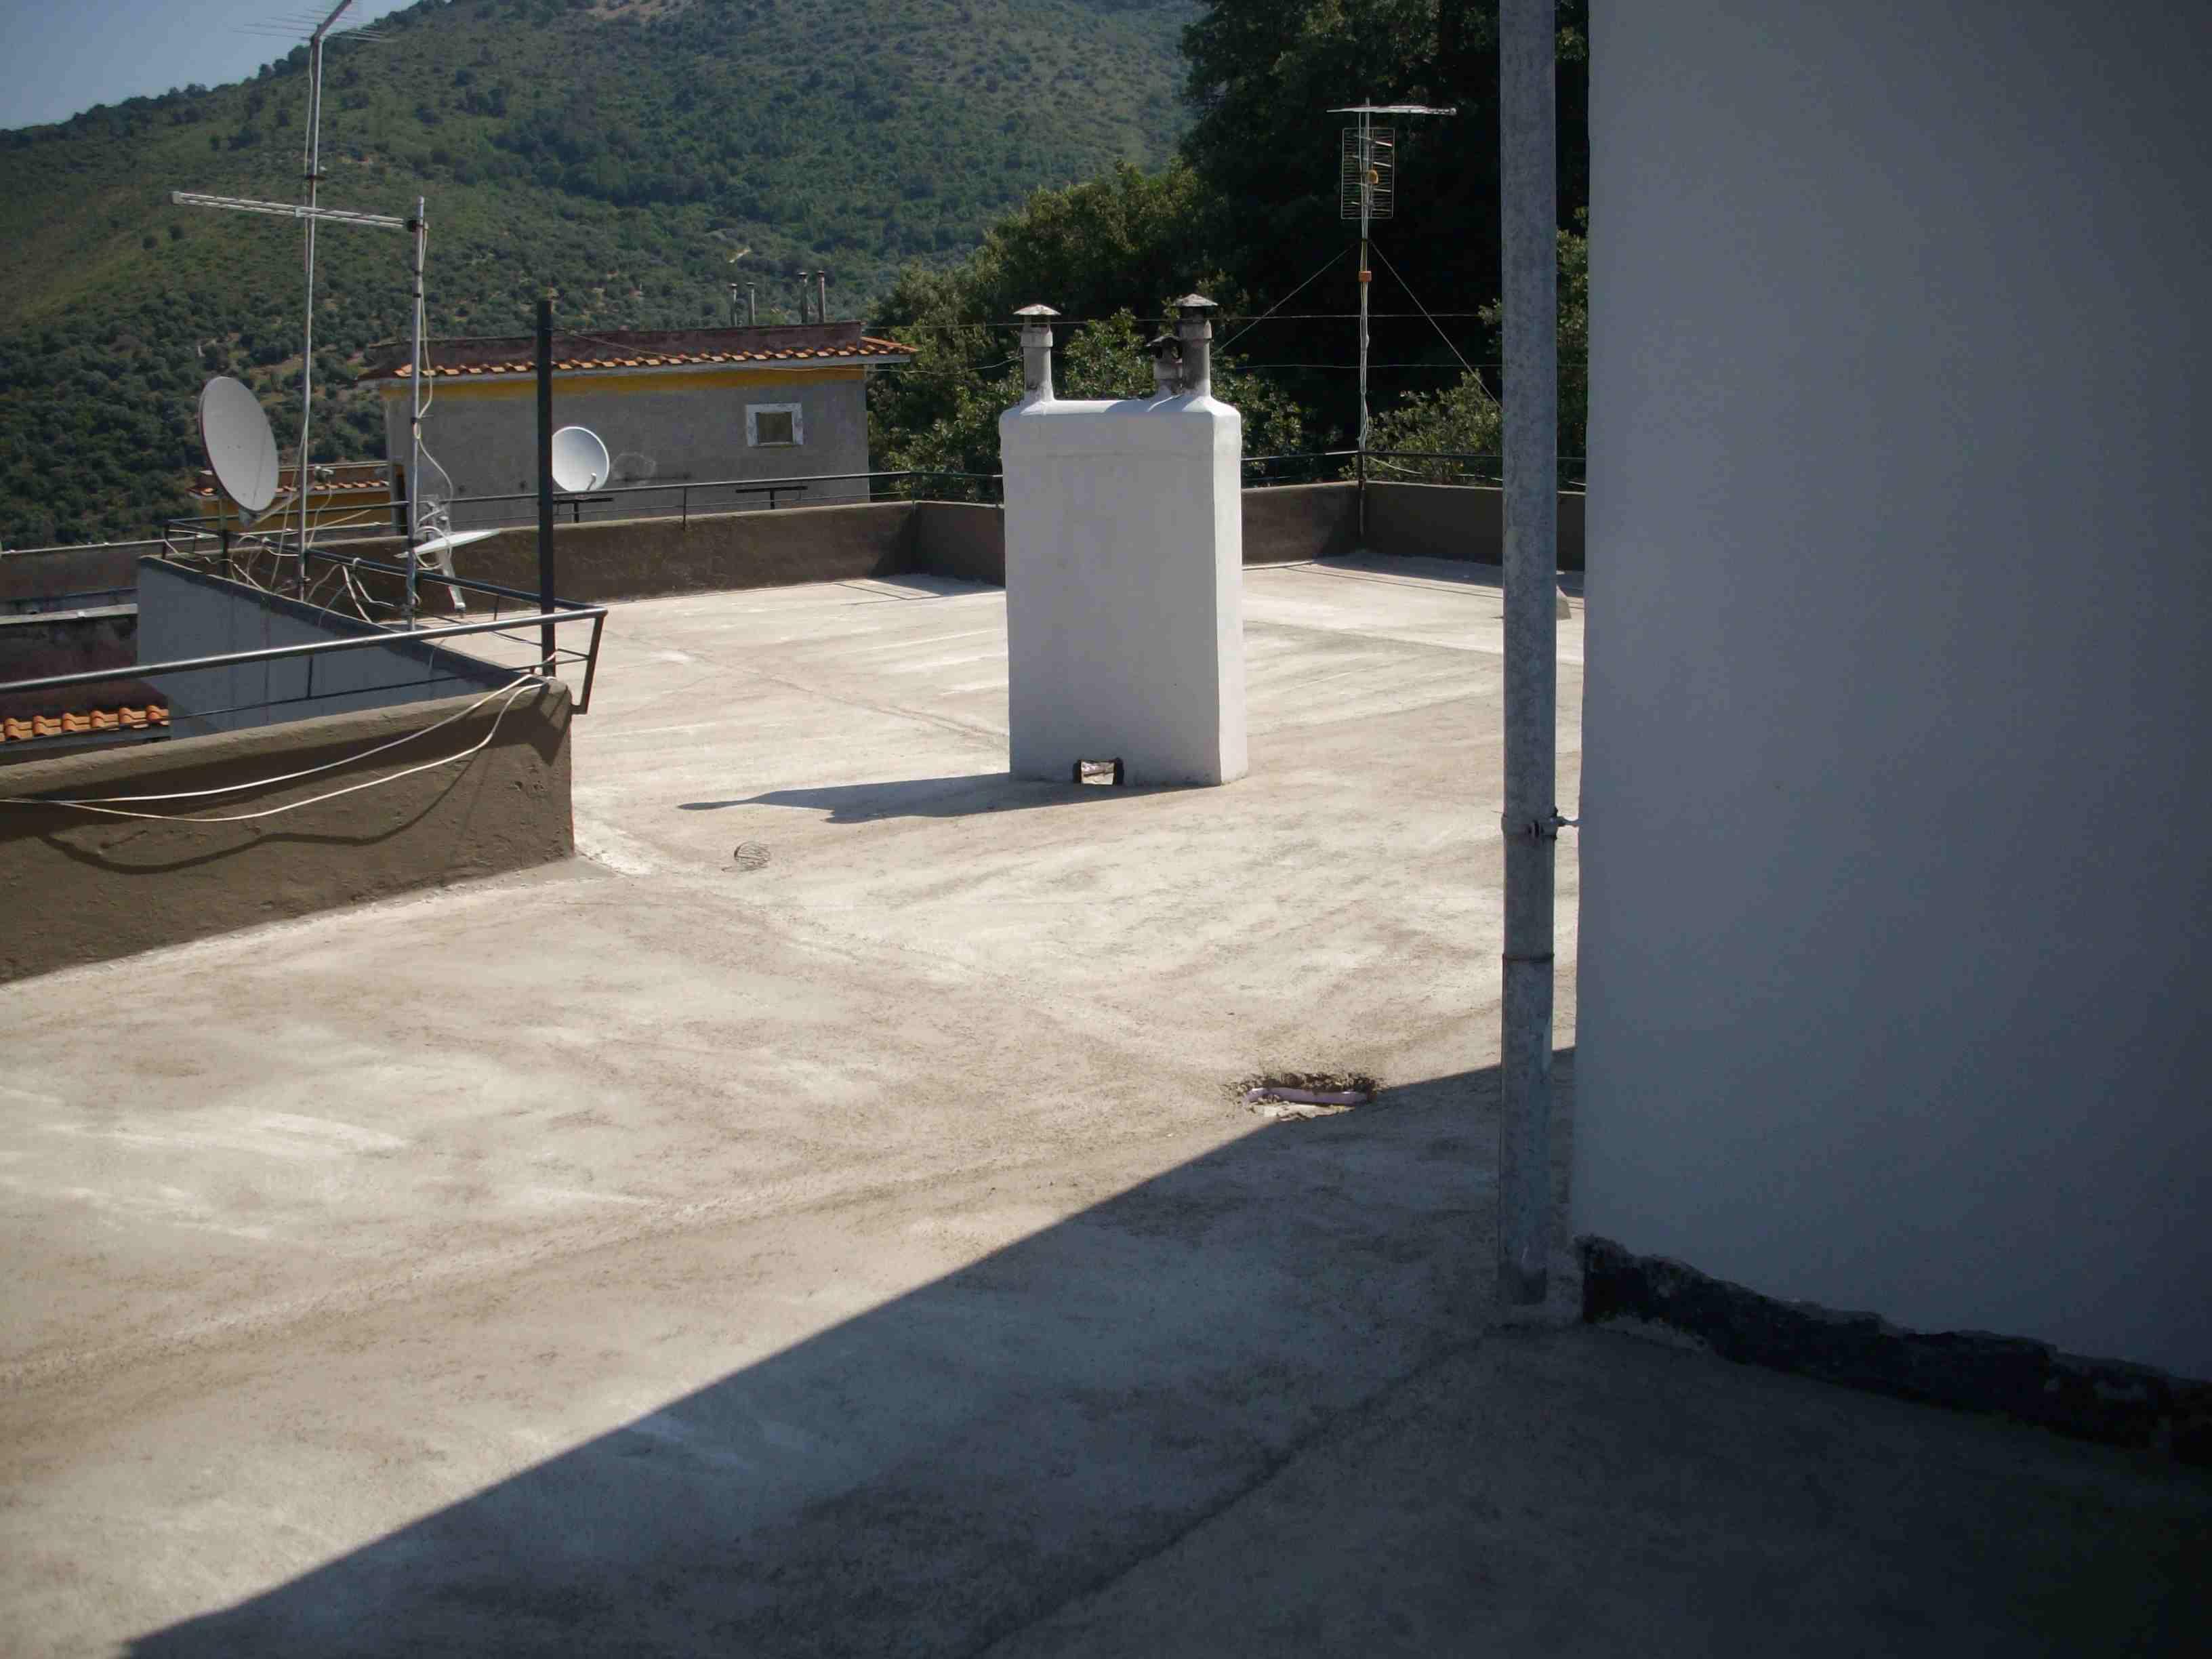 Beautiful Rifacimento Terrazzo Condominiale Ideas - Amazing Design ...